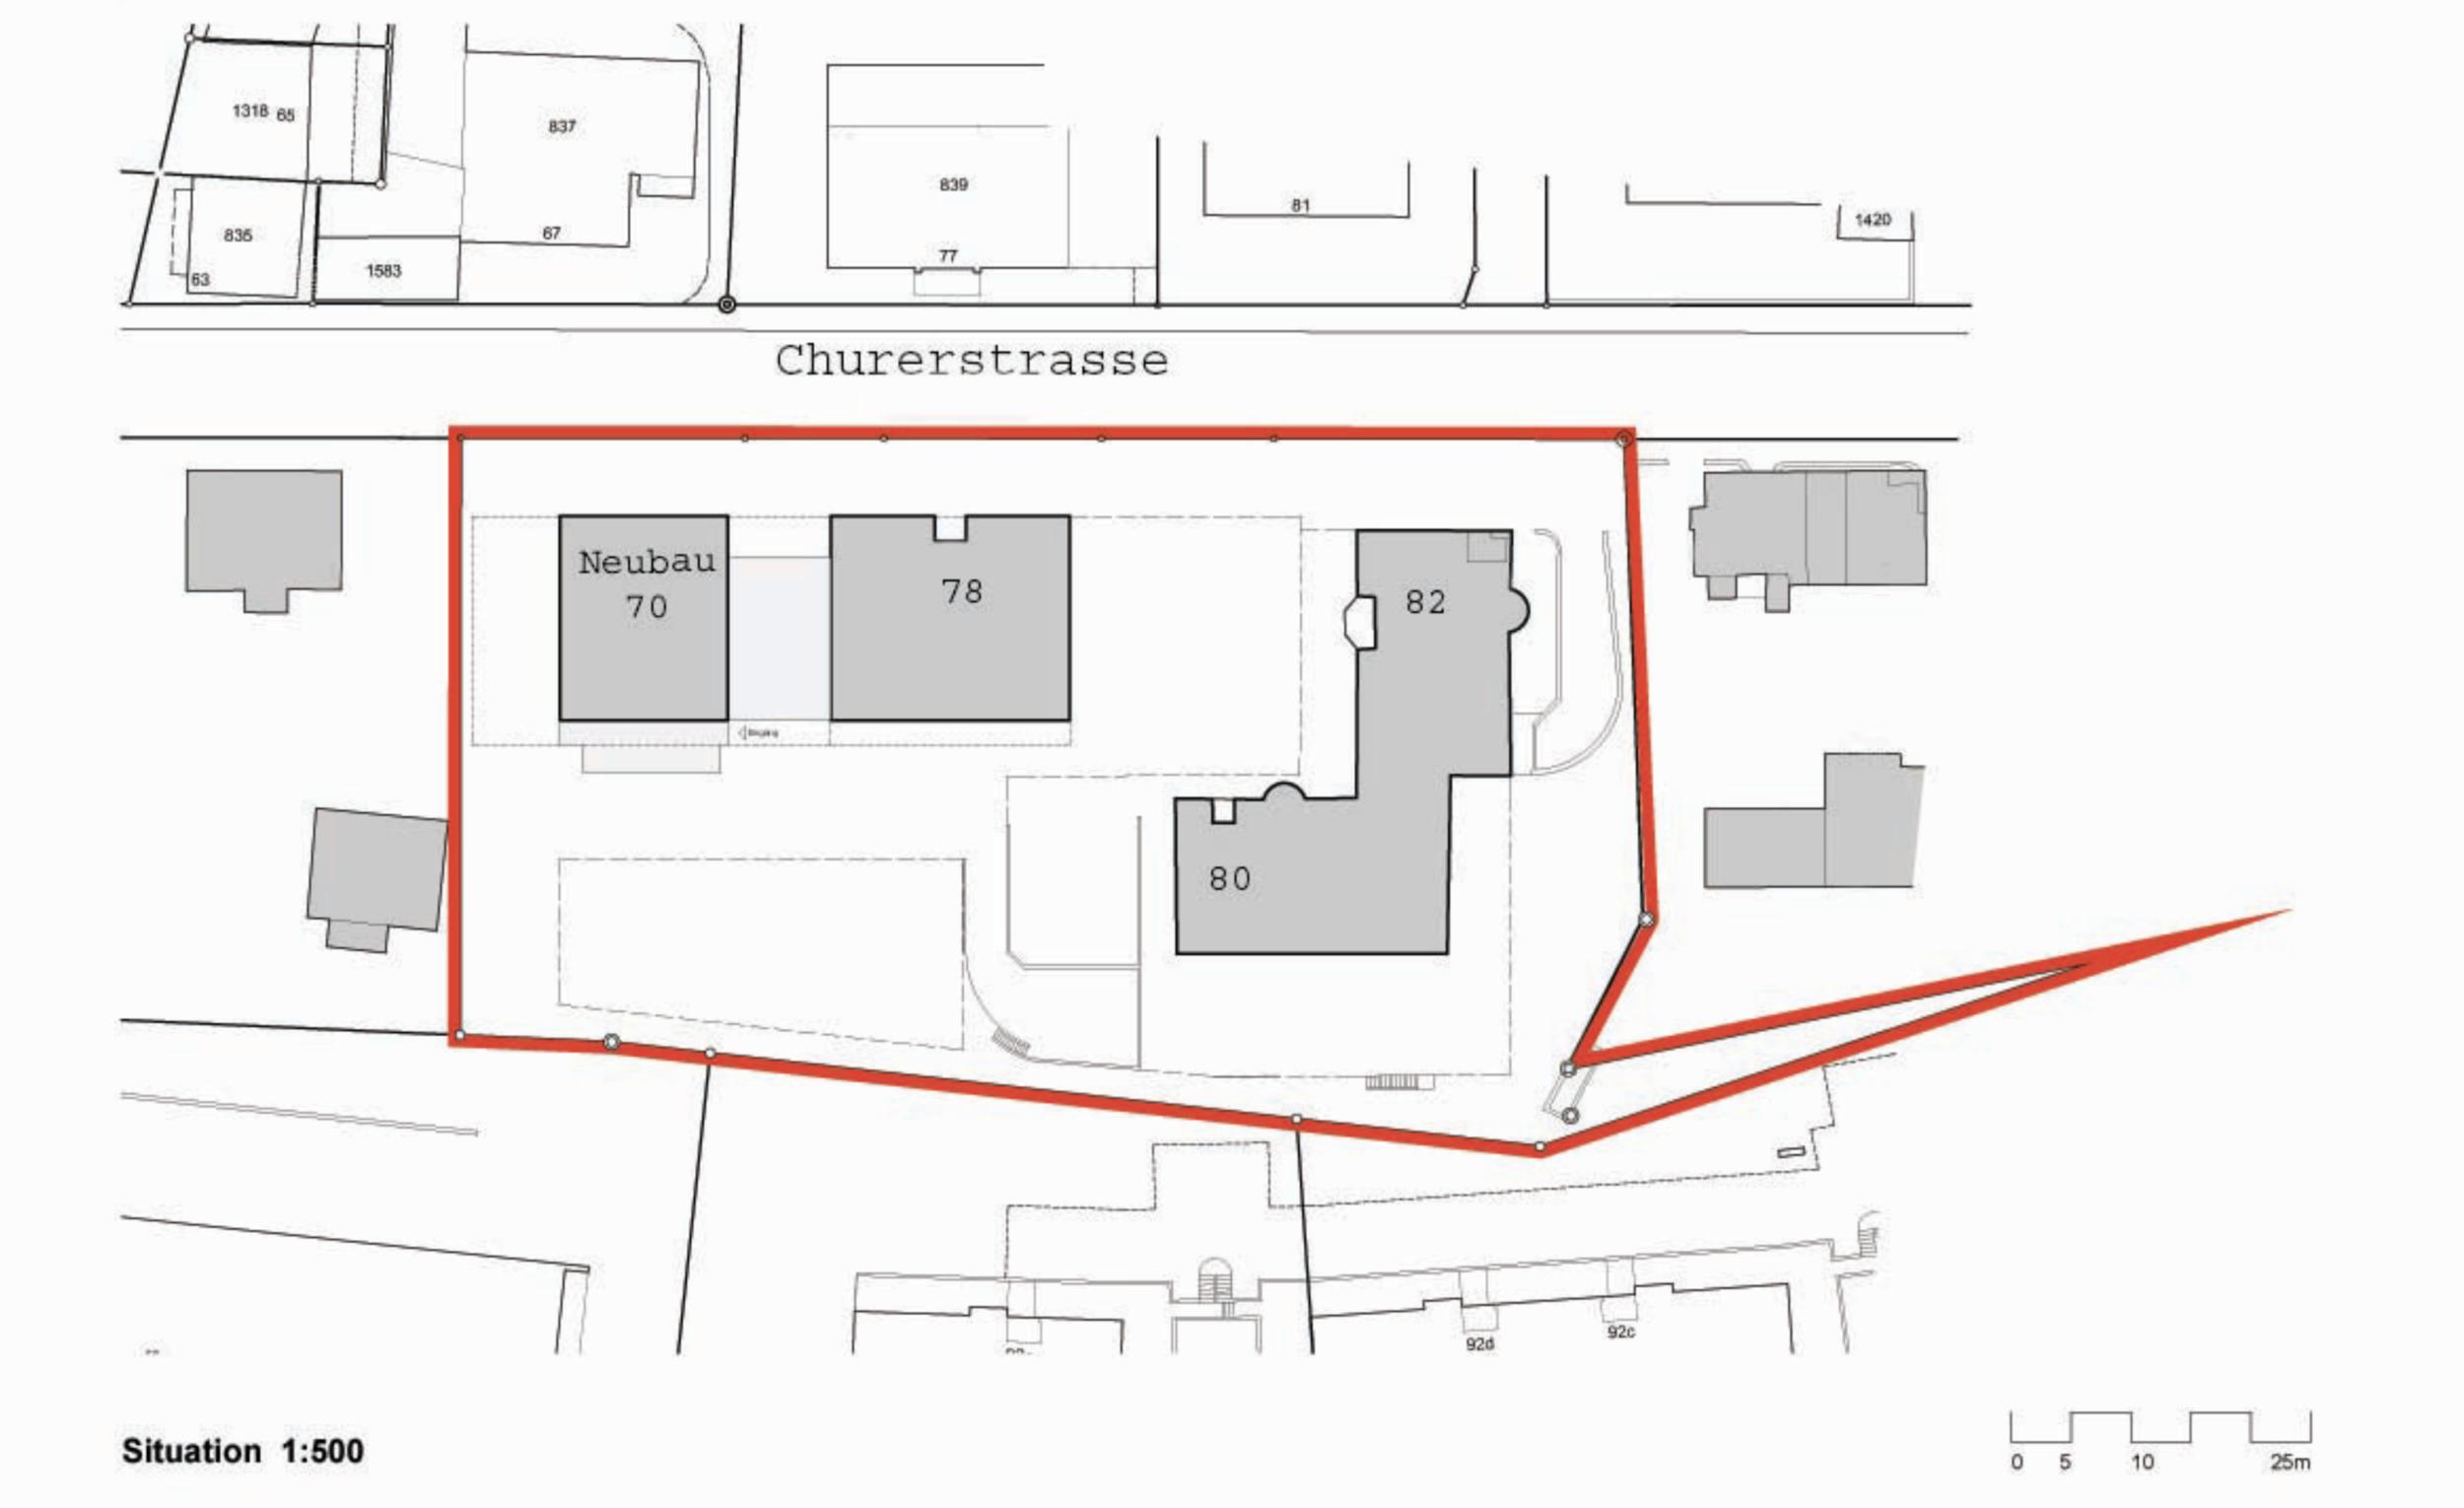 Sagi Immobilien, Churerstrasse, Situationsplan